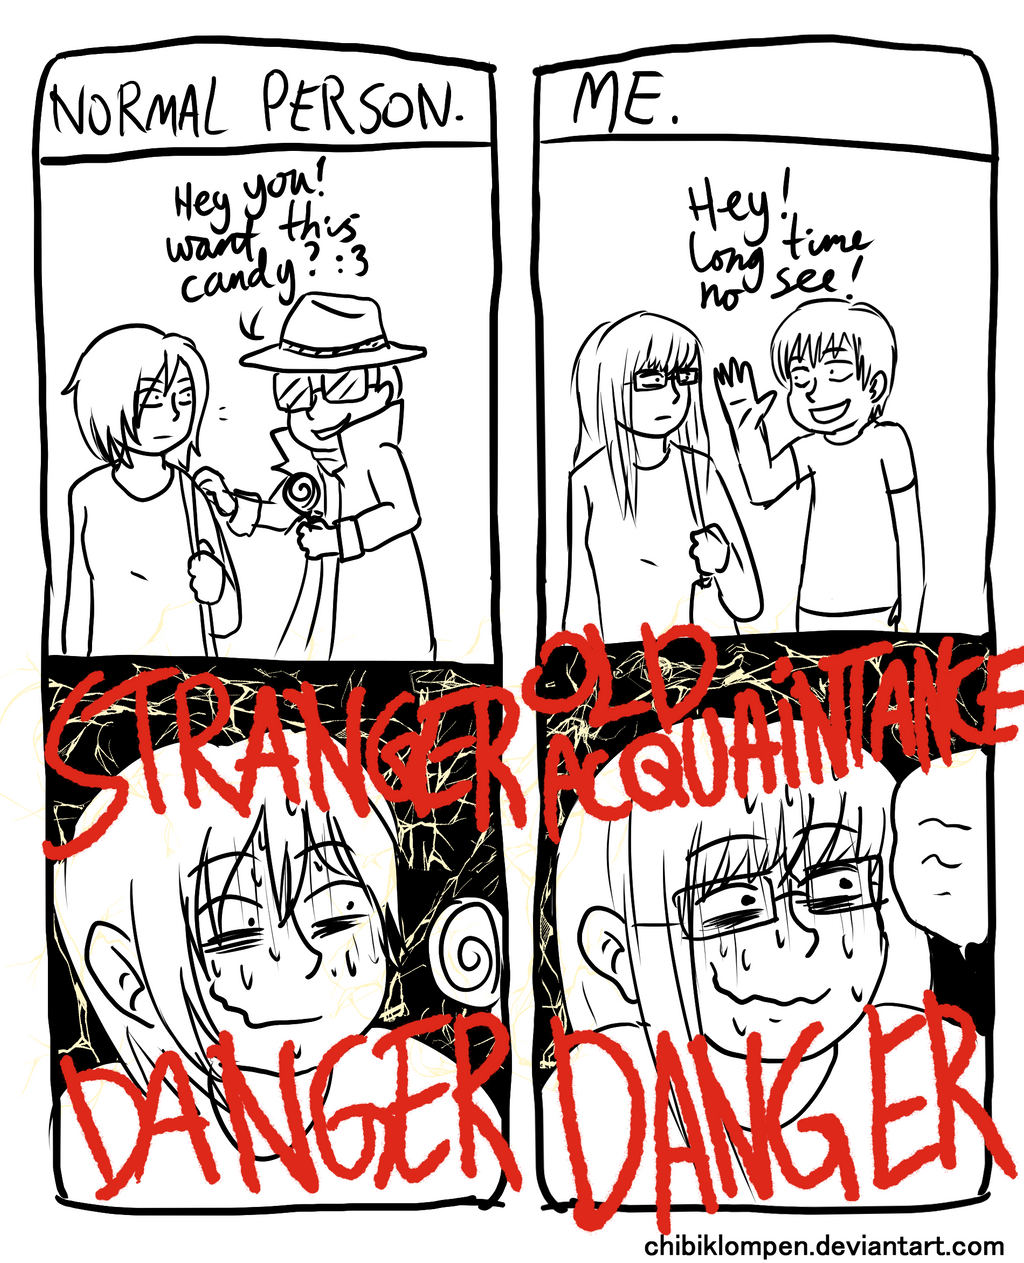 stranger danger by Chibiklompen